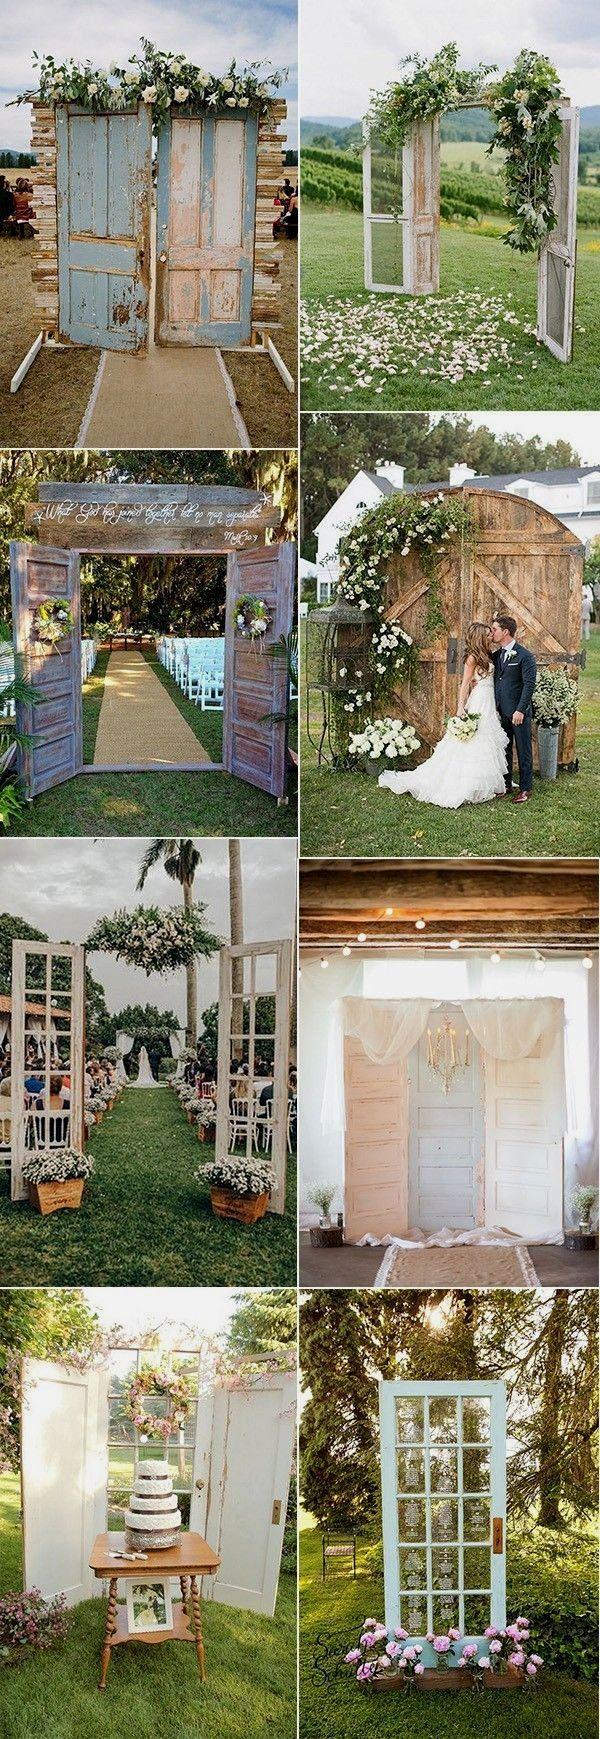 New Rustic Wedding Decoration Ideas #weddingdecoration ...